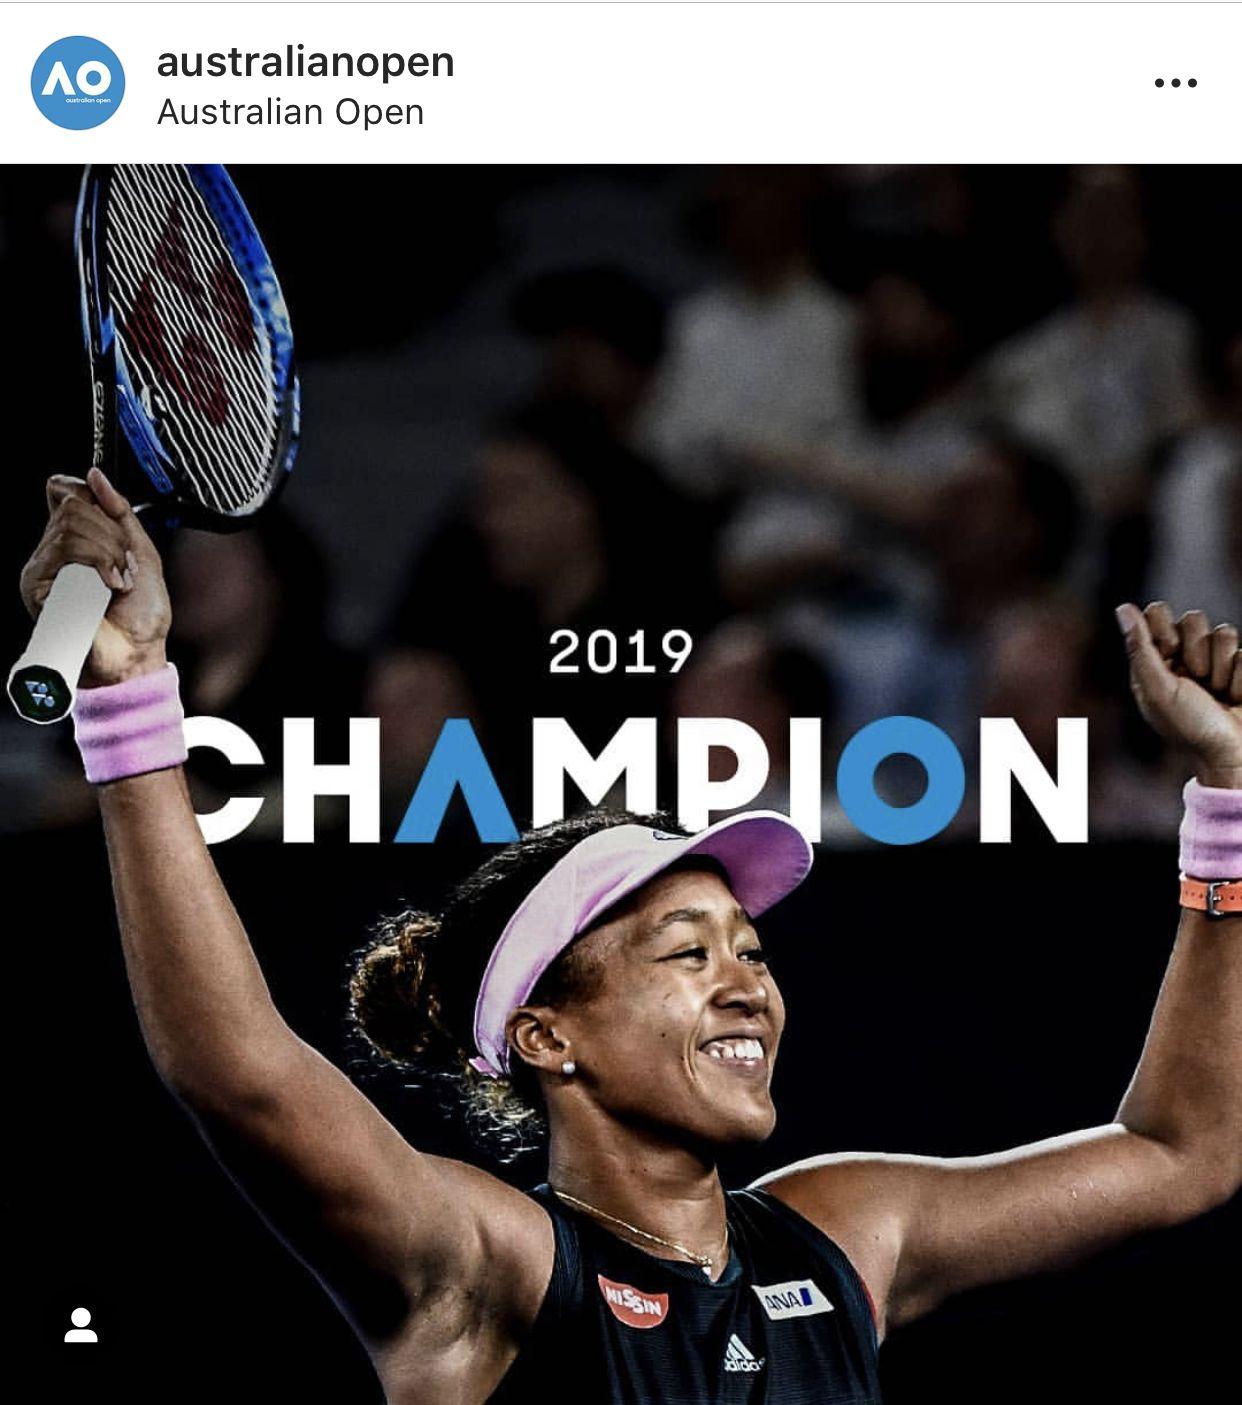 Congratulations To Naomiosakatennis And Her Team Naomiosaka Australianopen Champion Australian Open Tennis Players Female Osaka